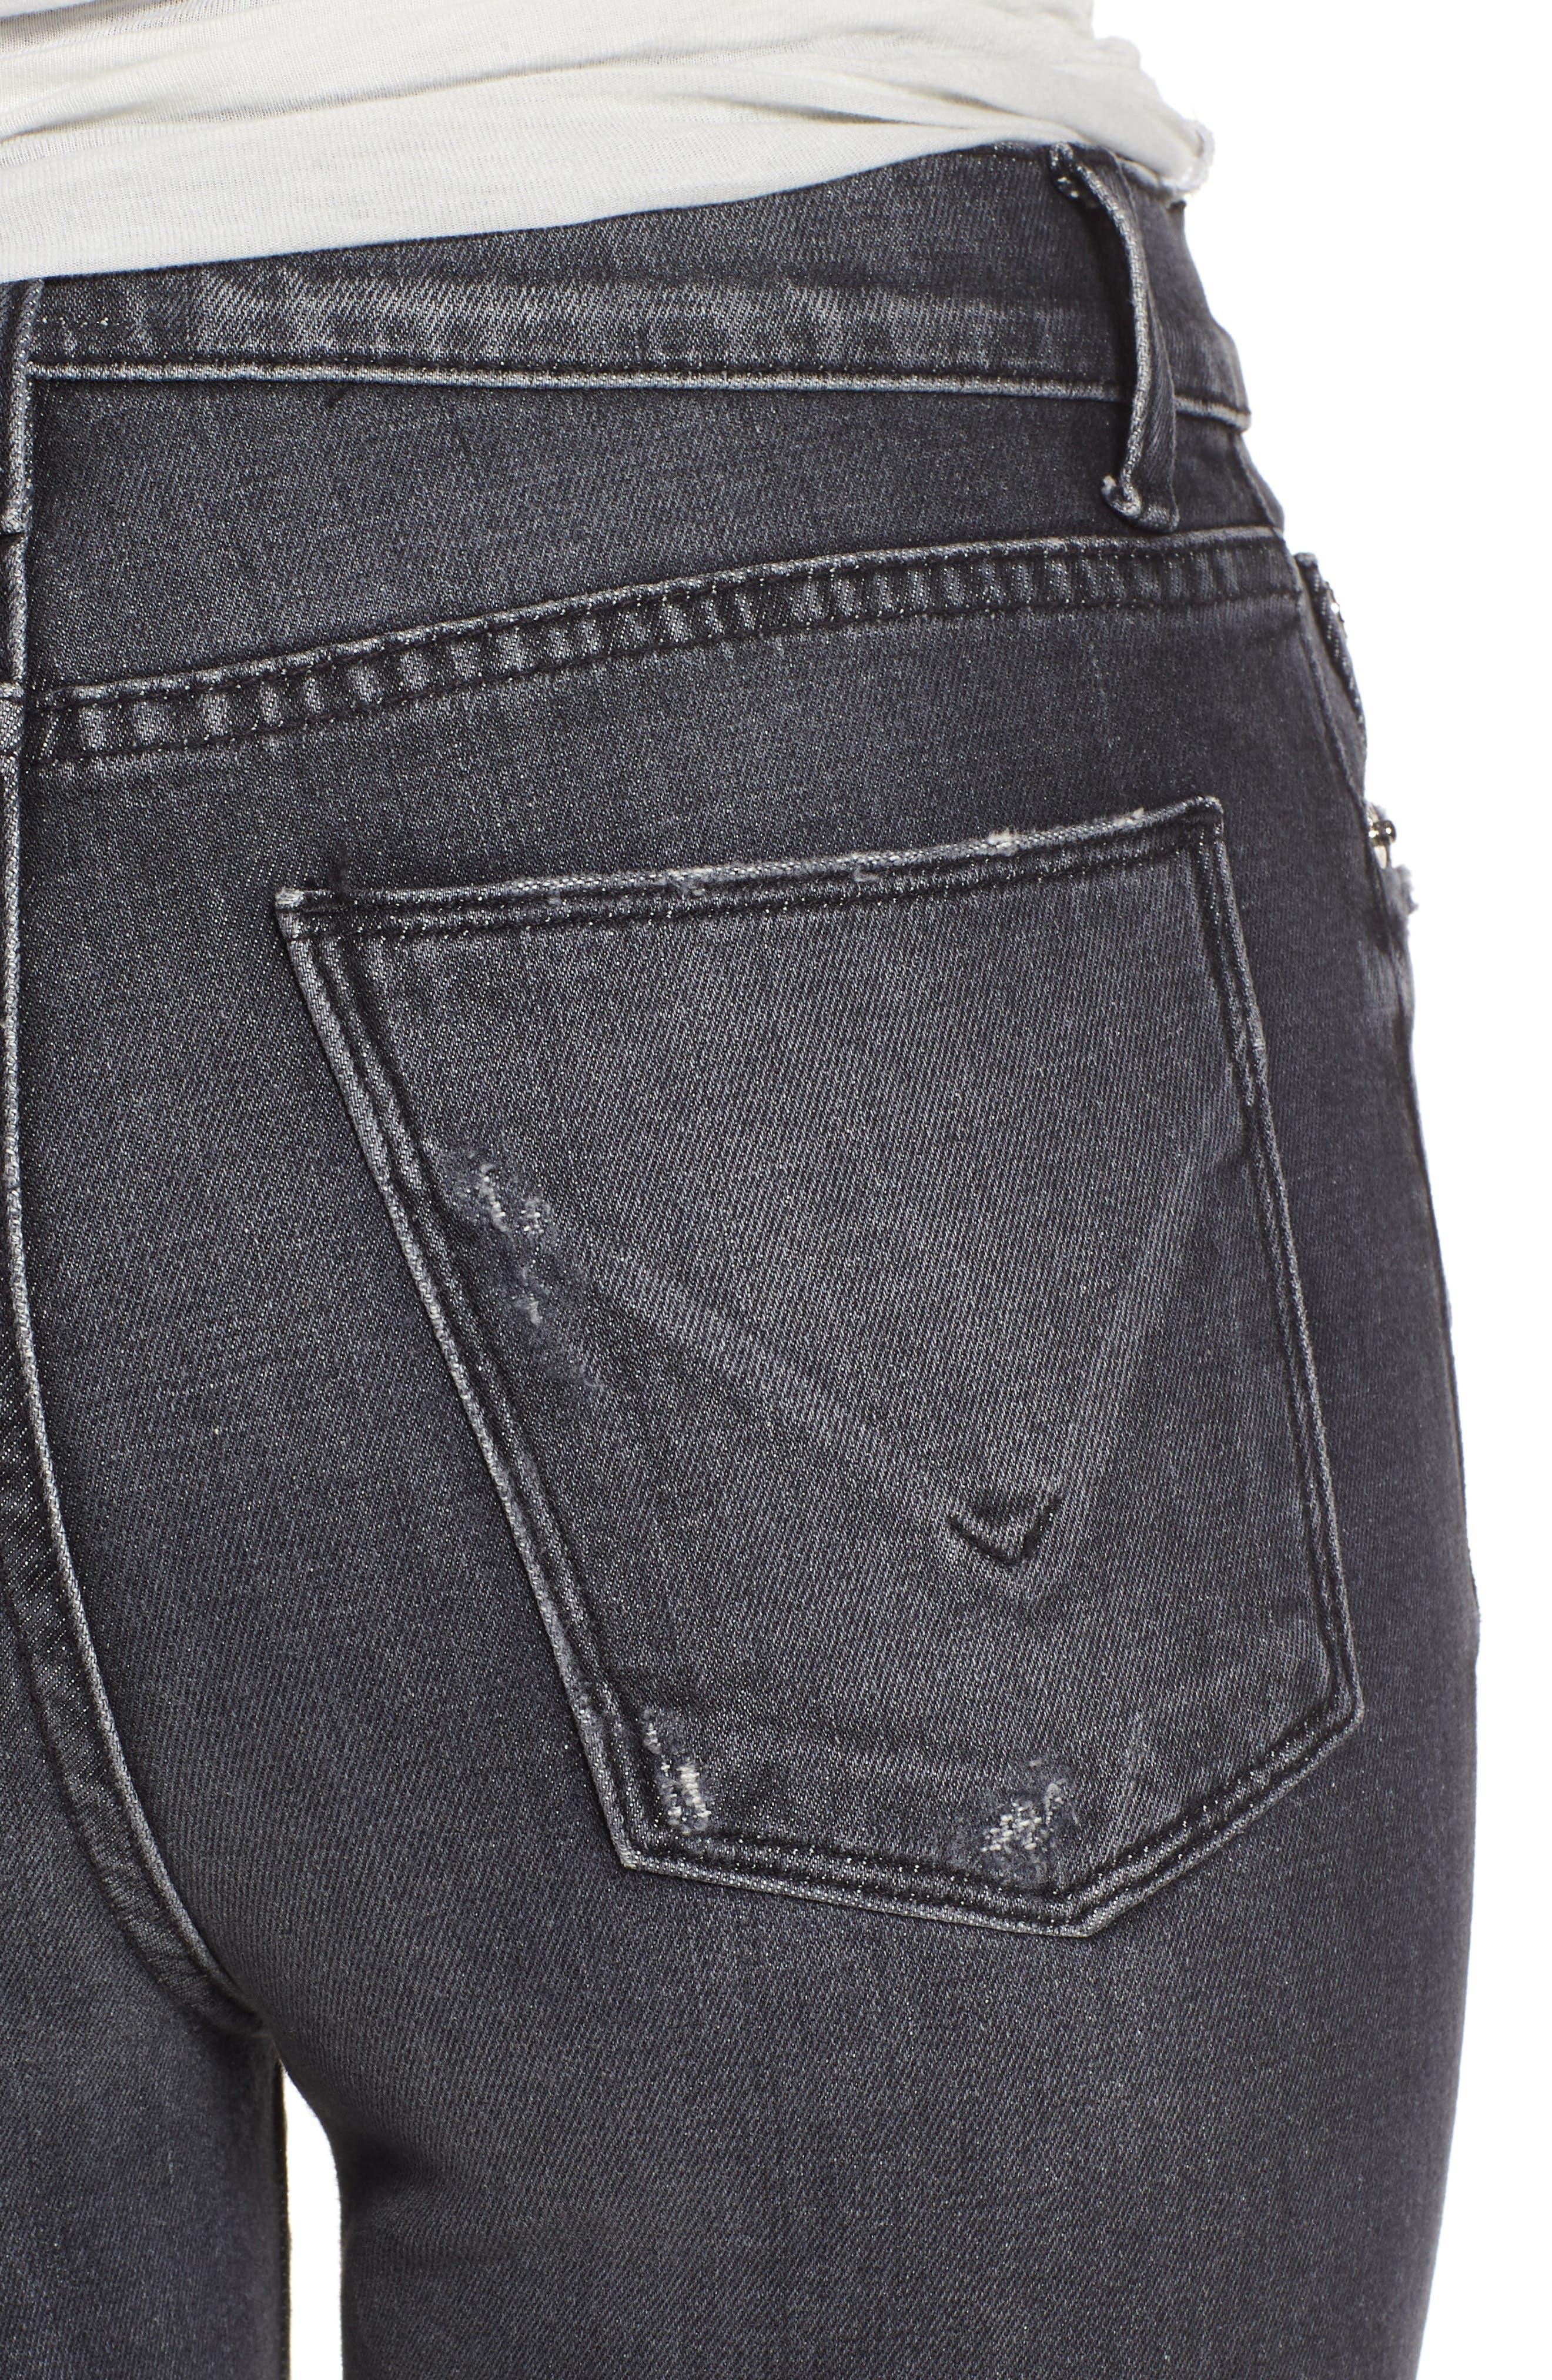 Alternate Image 4  - Hudson Jeans Zoeey High Waist Cutoff Boyfriend Shorts (Malice)